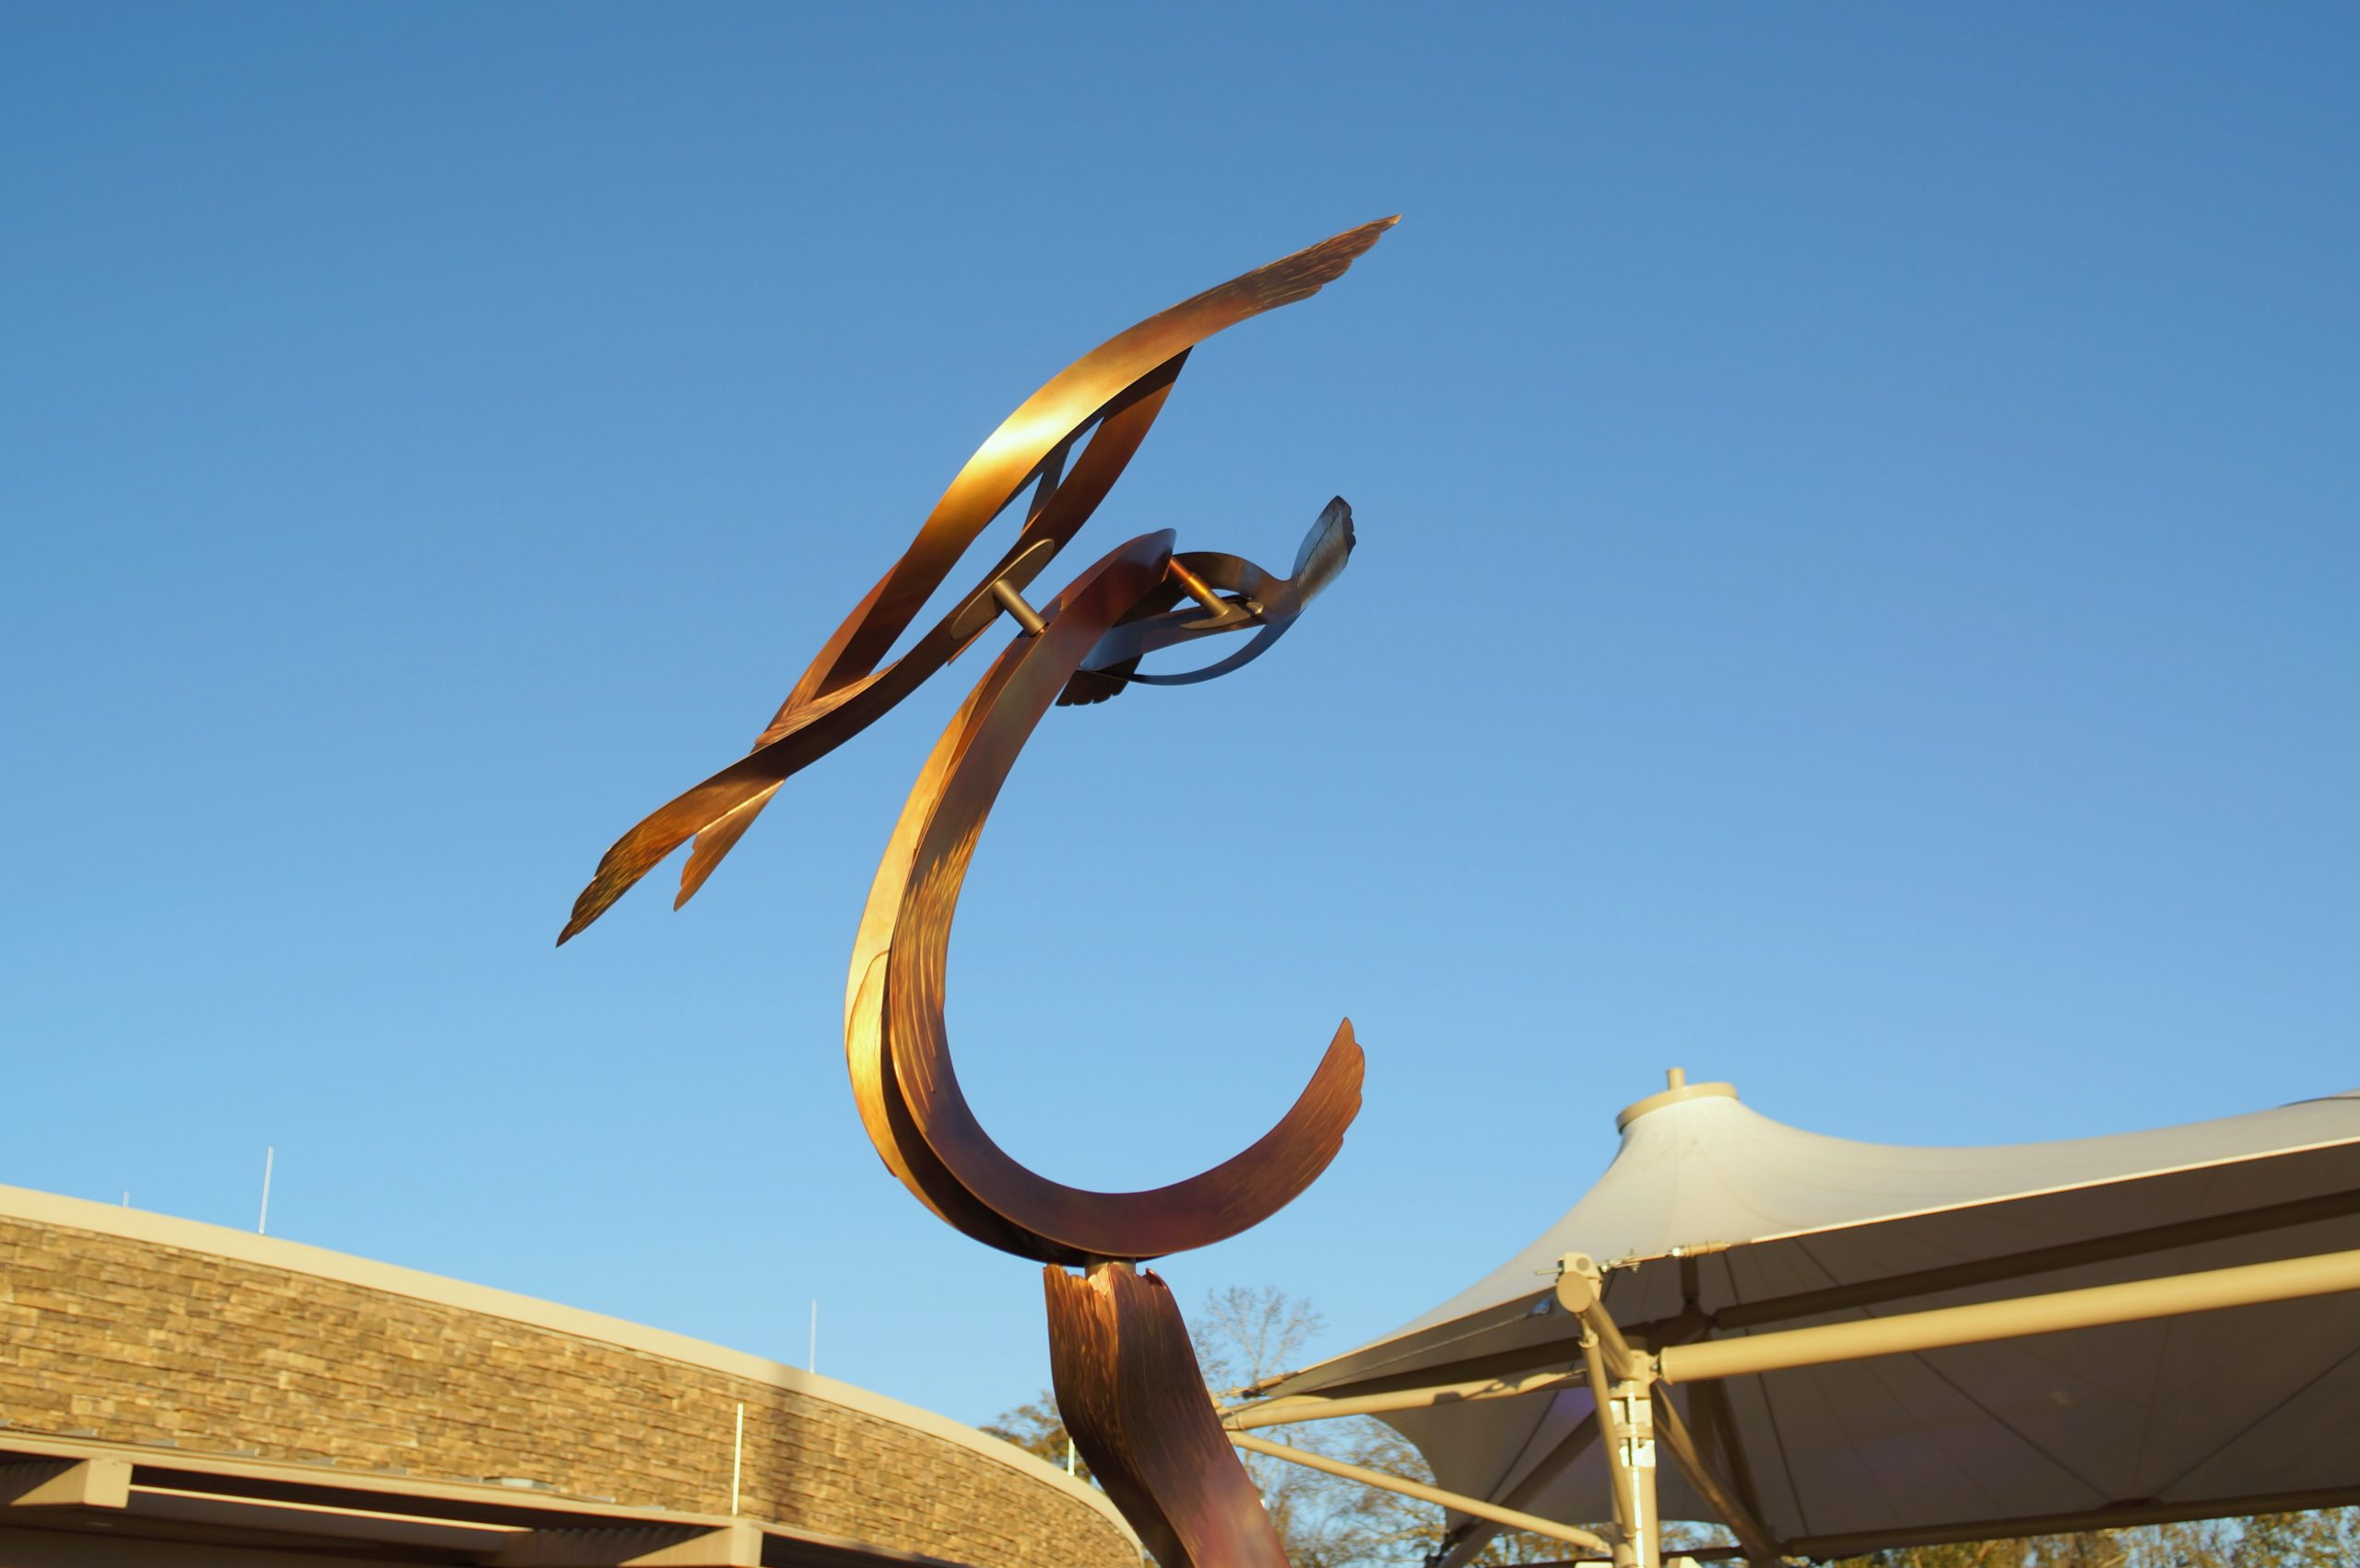 Wind Feathers – Montgomery Alabama